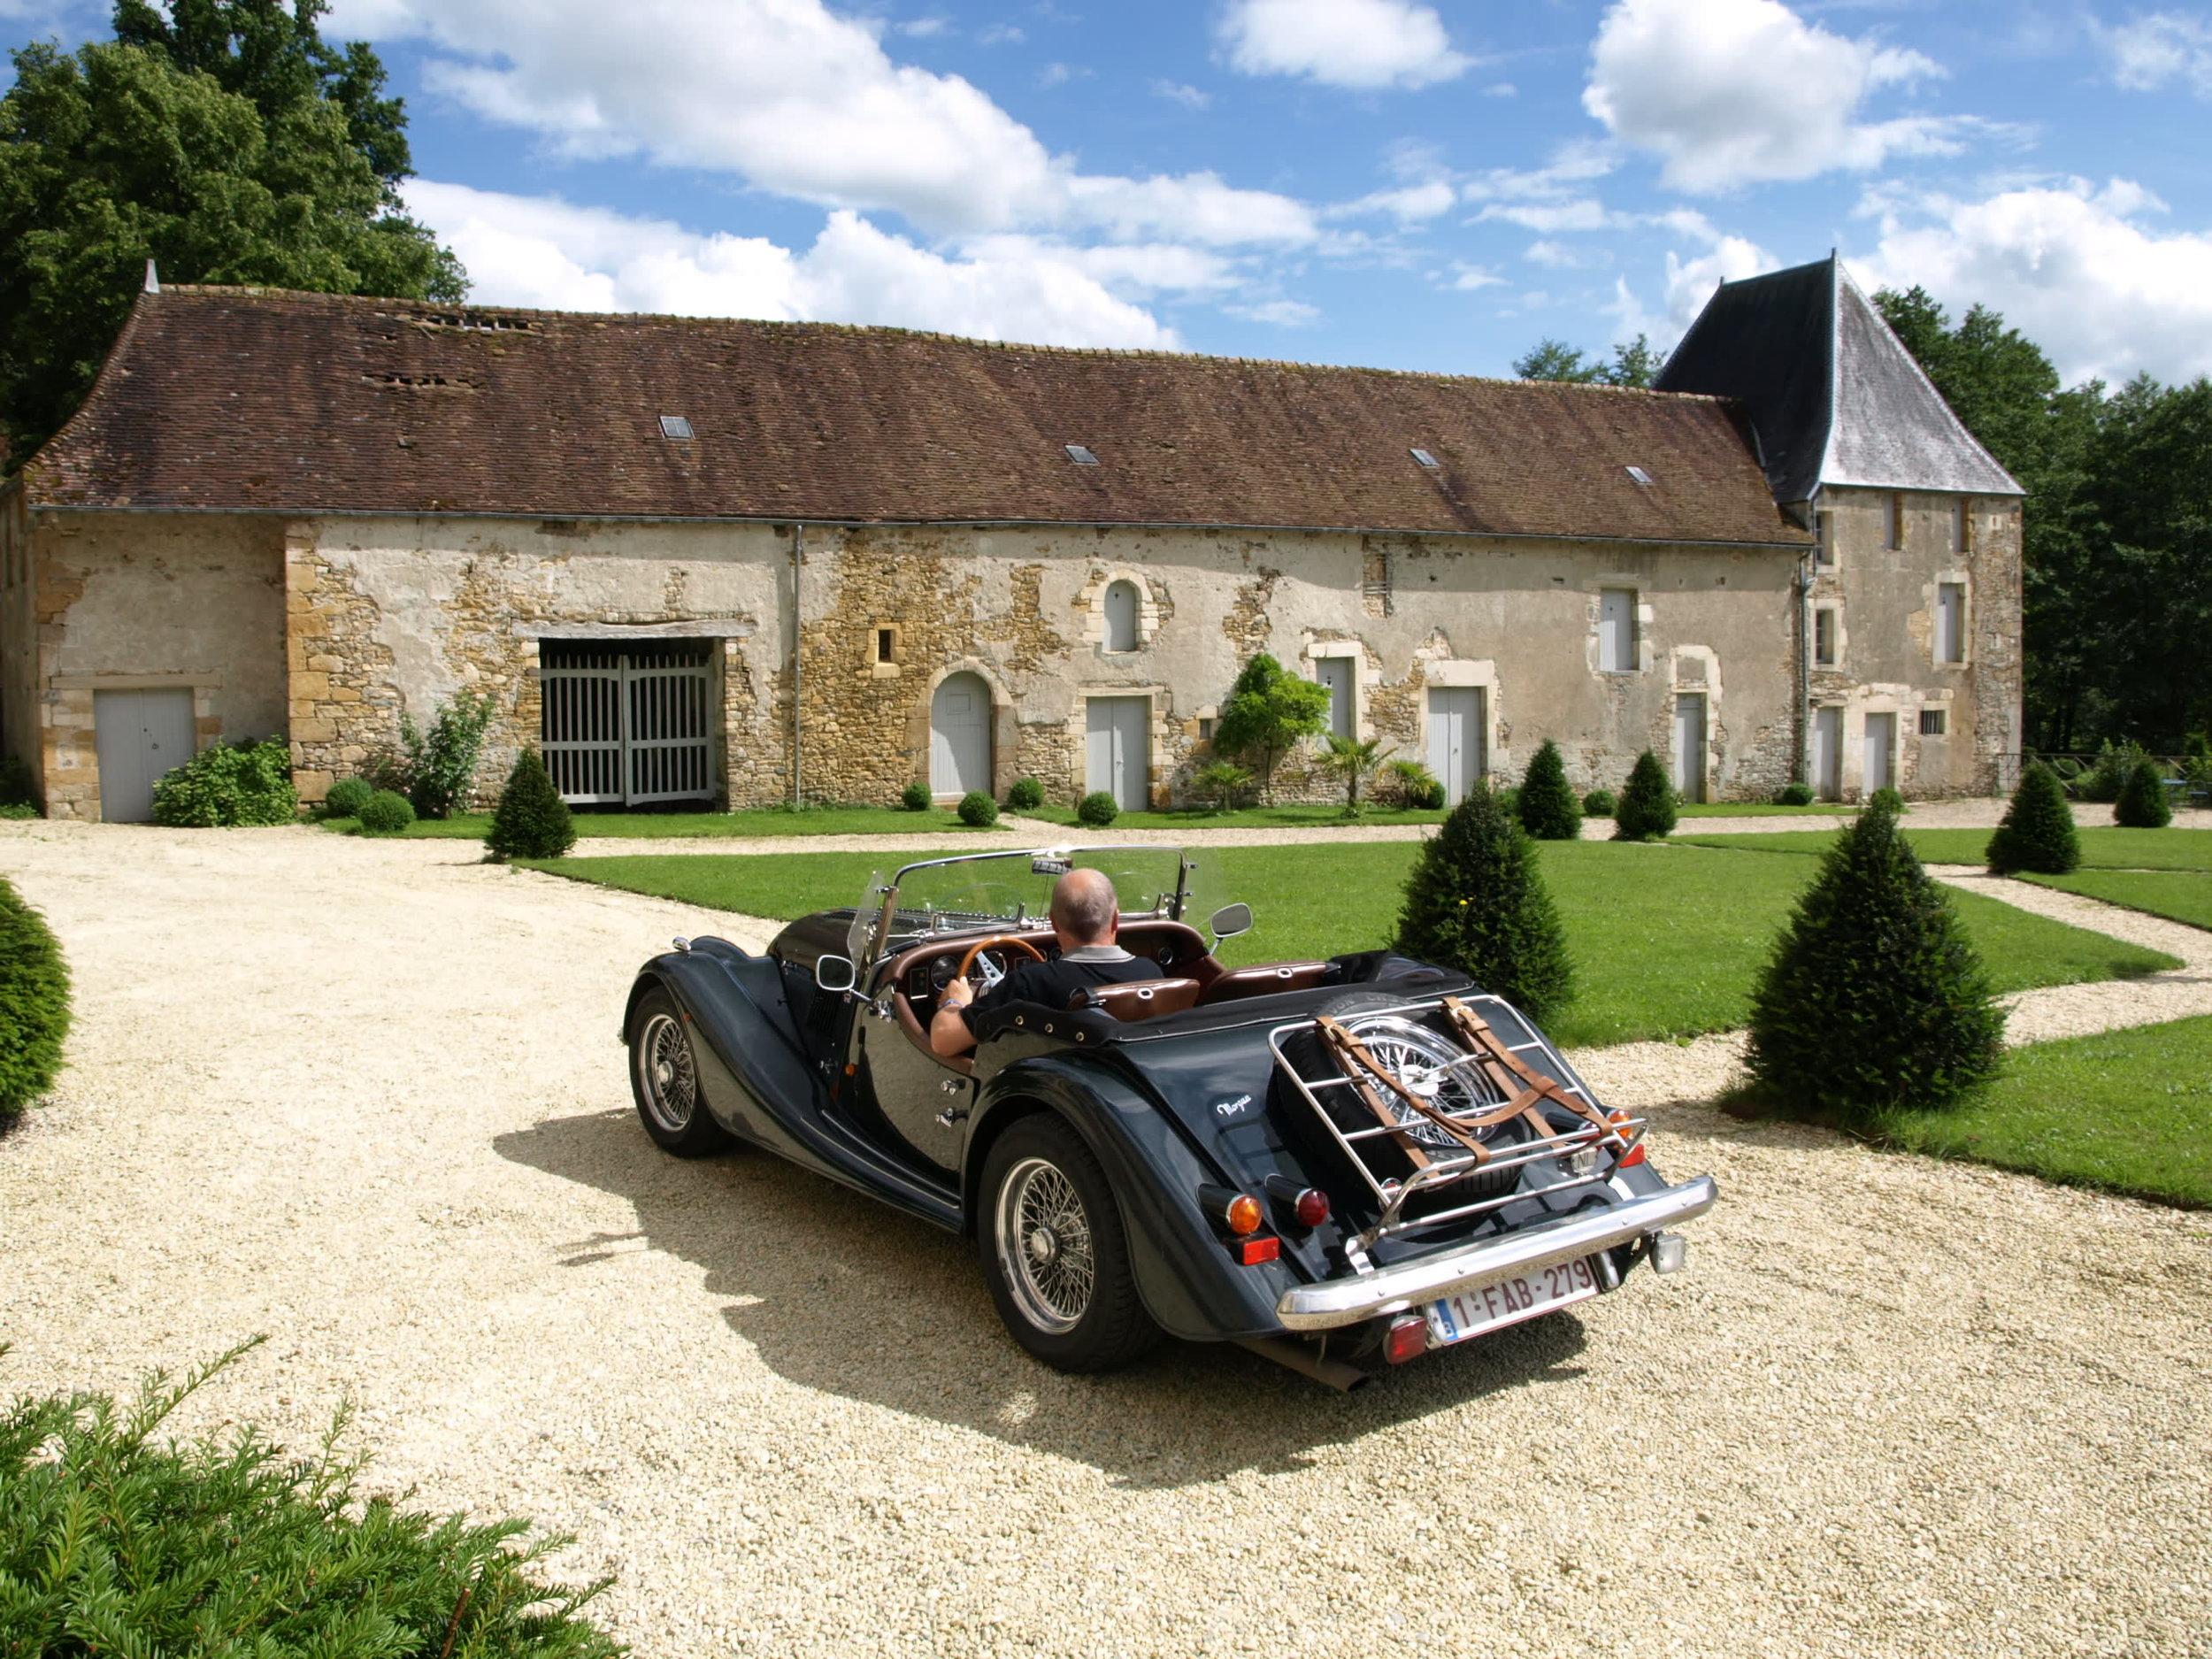 Chateau de la Pommeraye - charming boutique hotel chateau b&b spa normandy calvados 6(3).jpg